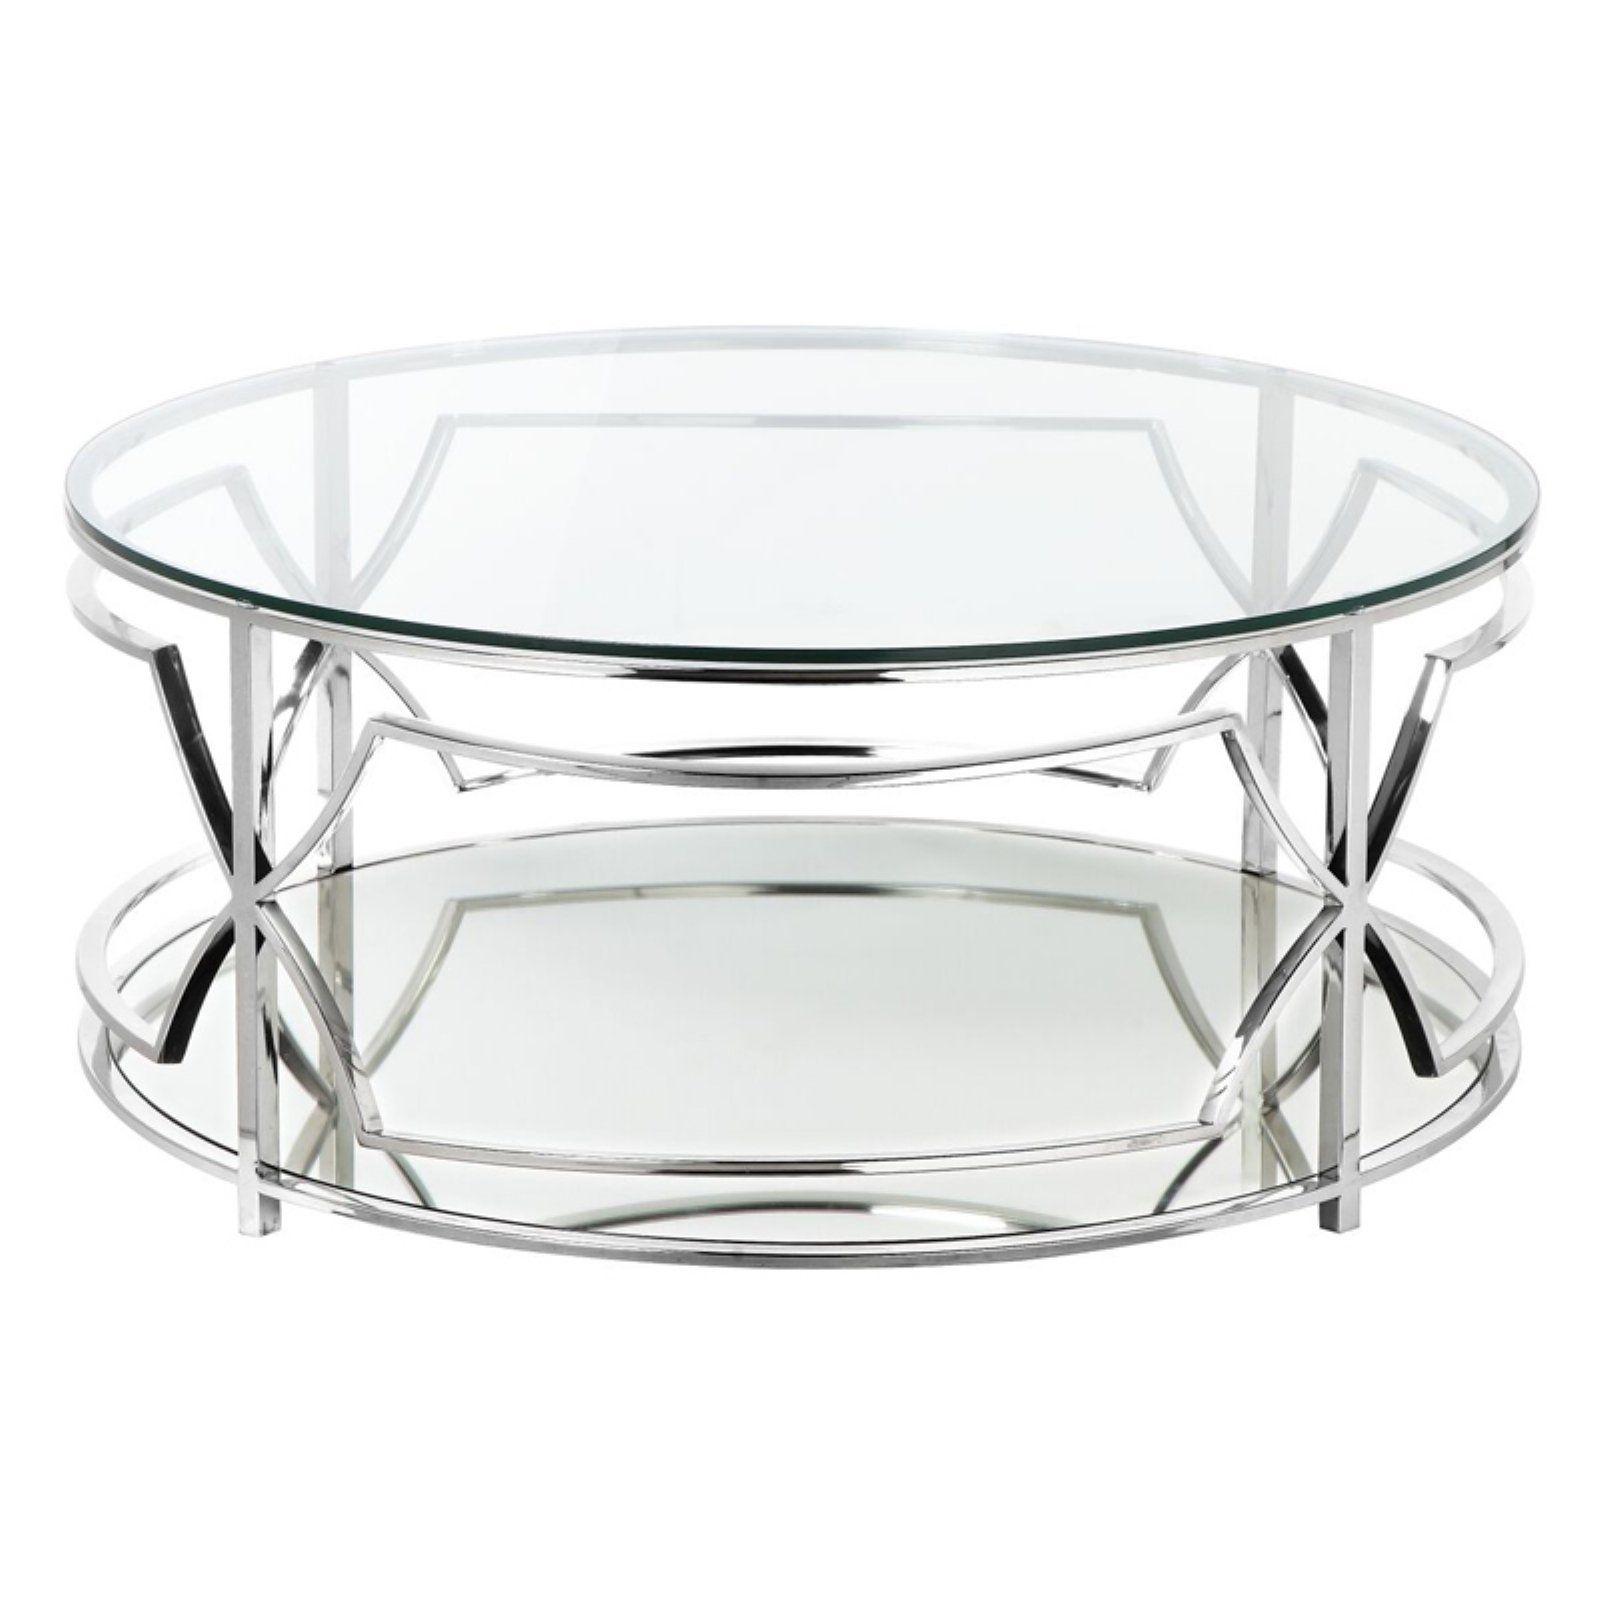 Pangea Home Edward Round Coffee Table Walmart Com Round Coffee Table Coffee Table Round Glass Coffee Table [ 1600 x 1600 Pixel ]